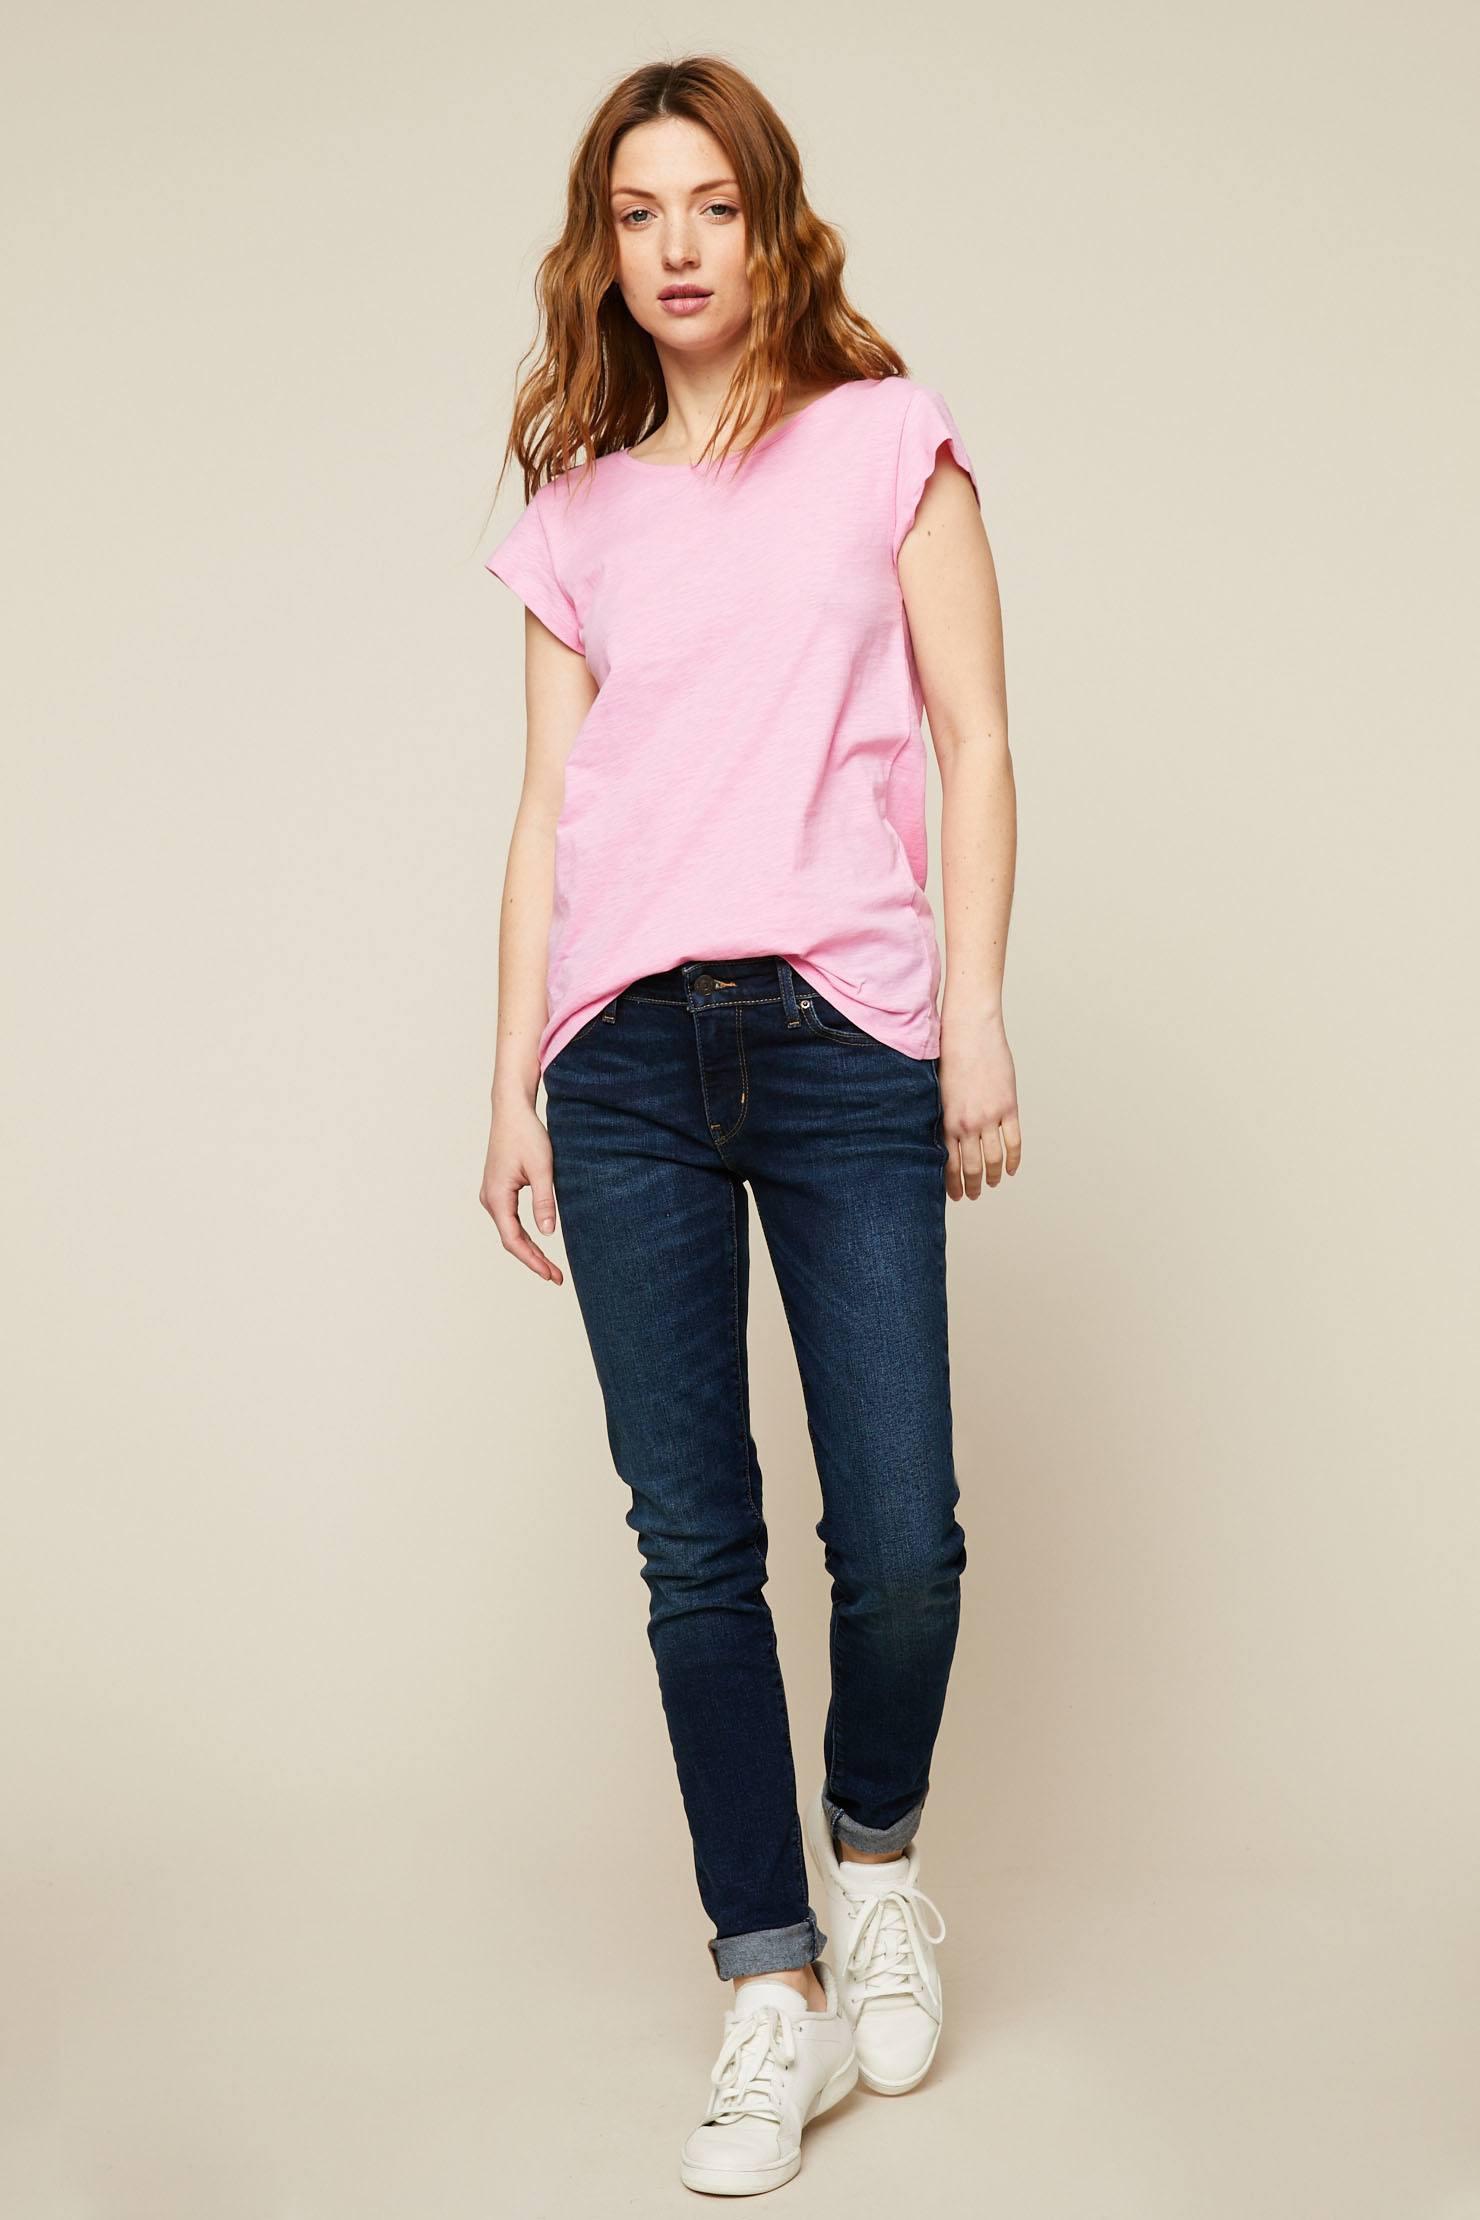 Foncé Femme Levi's Bleu Skinny Jeans Jean Monshowroom 711 7gv6Ybyf